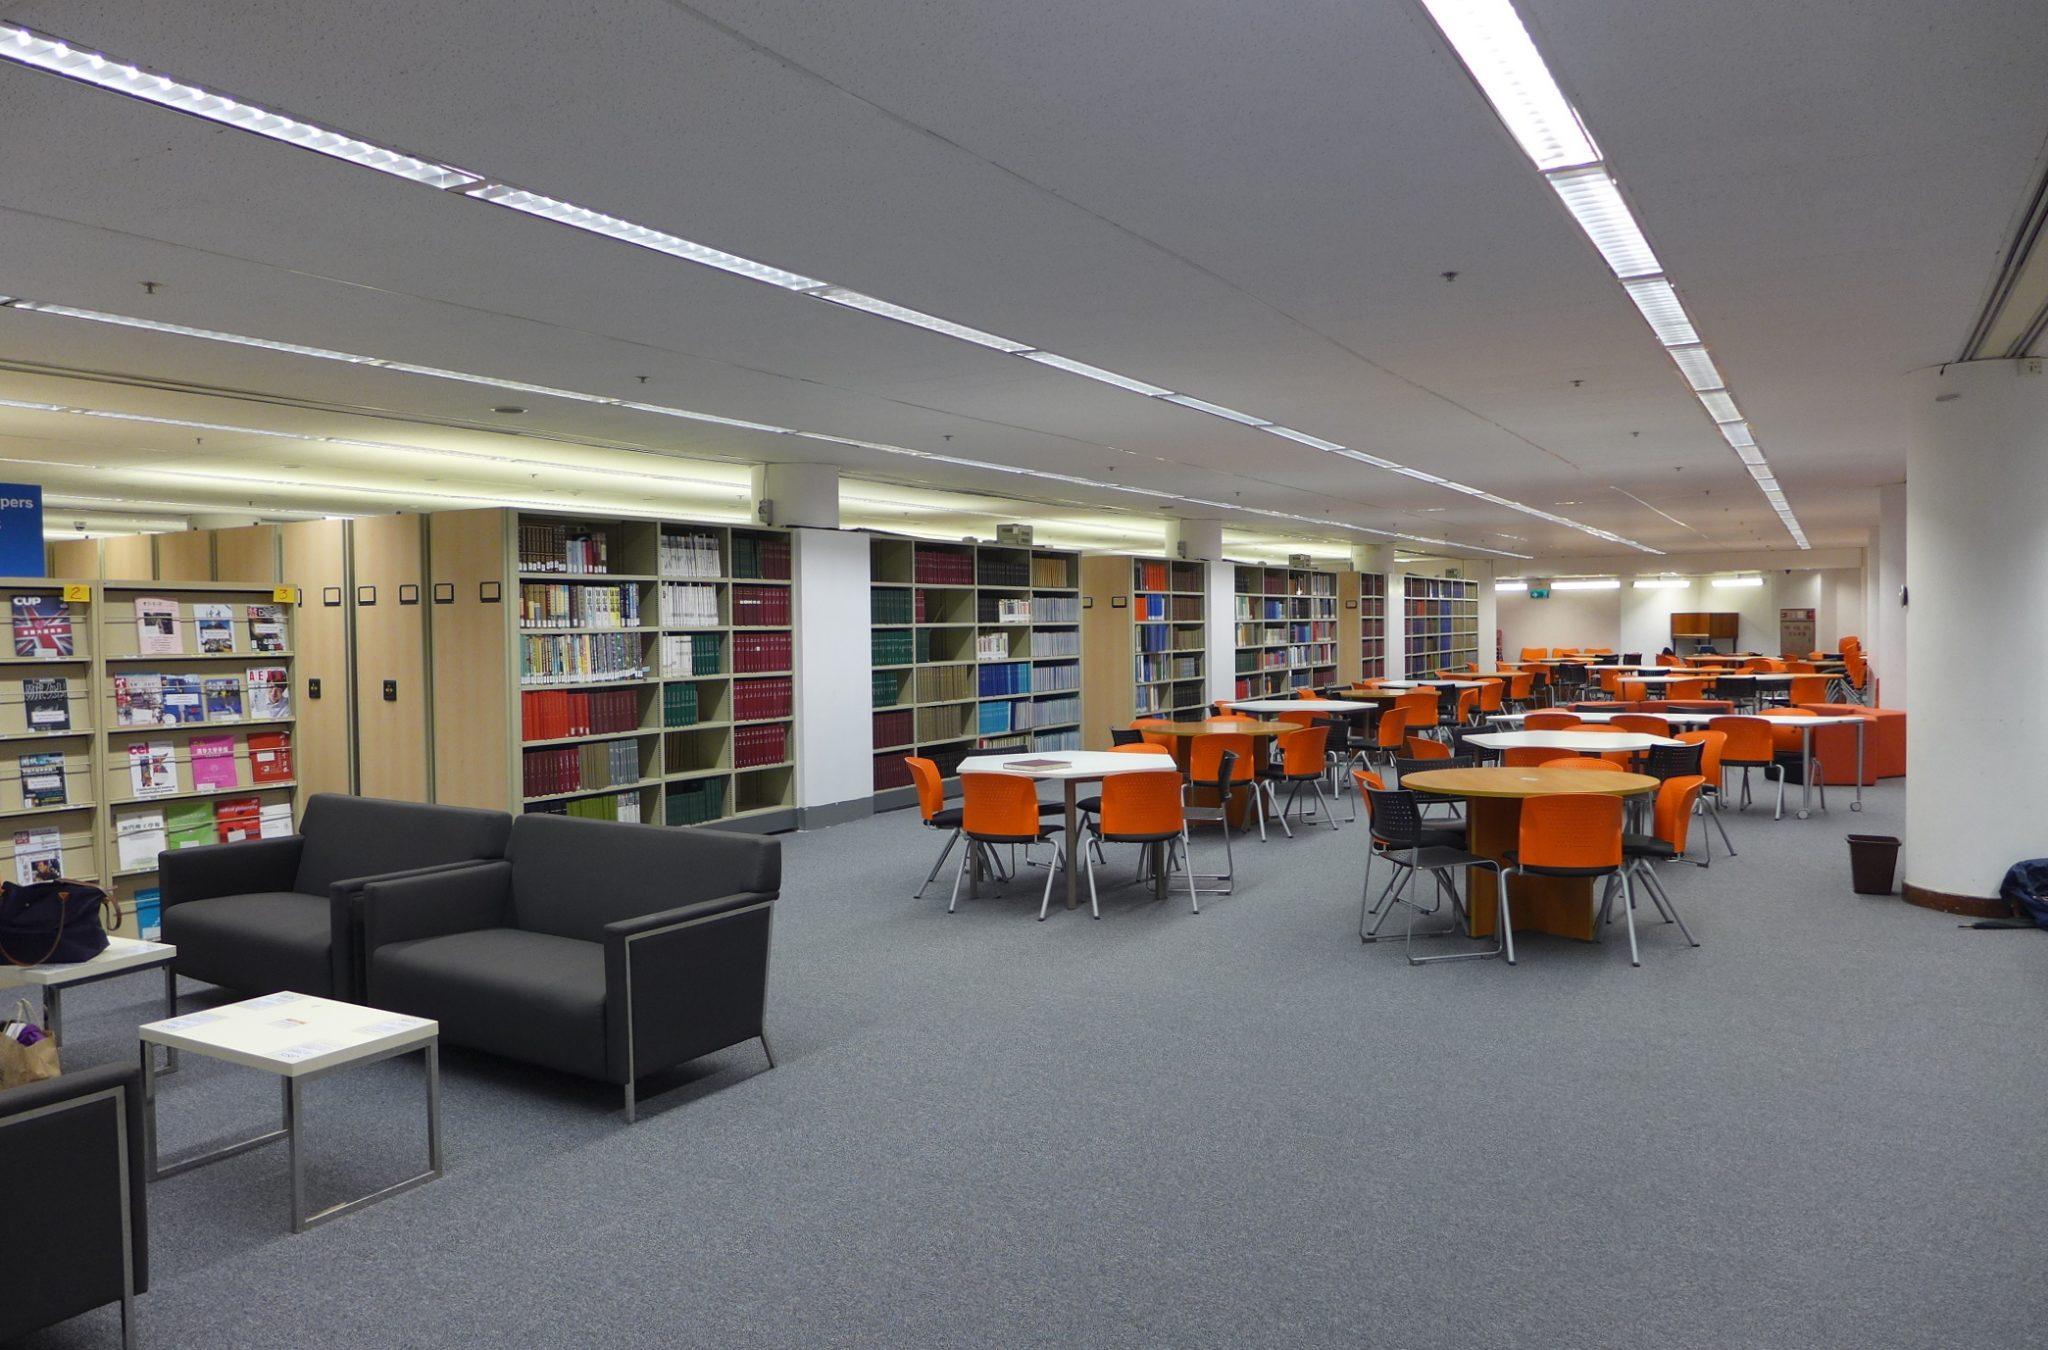 hong-kong-polytechnic-university